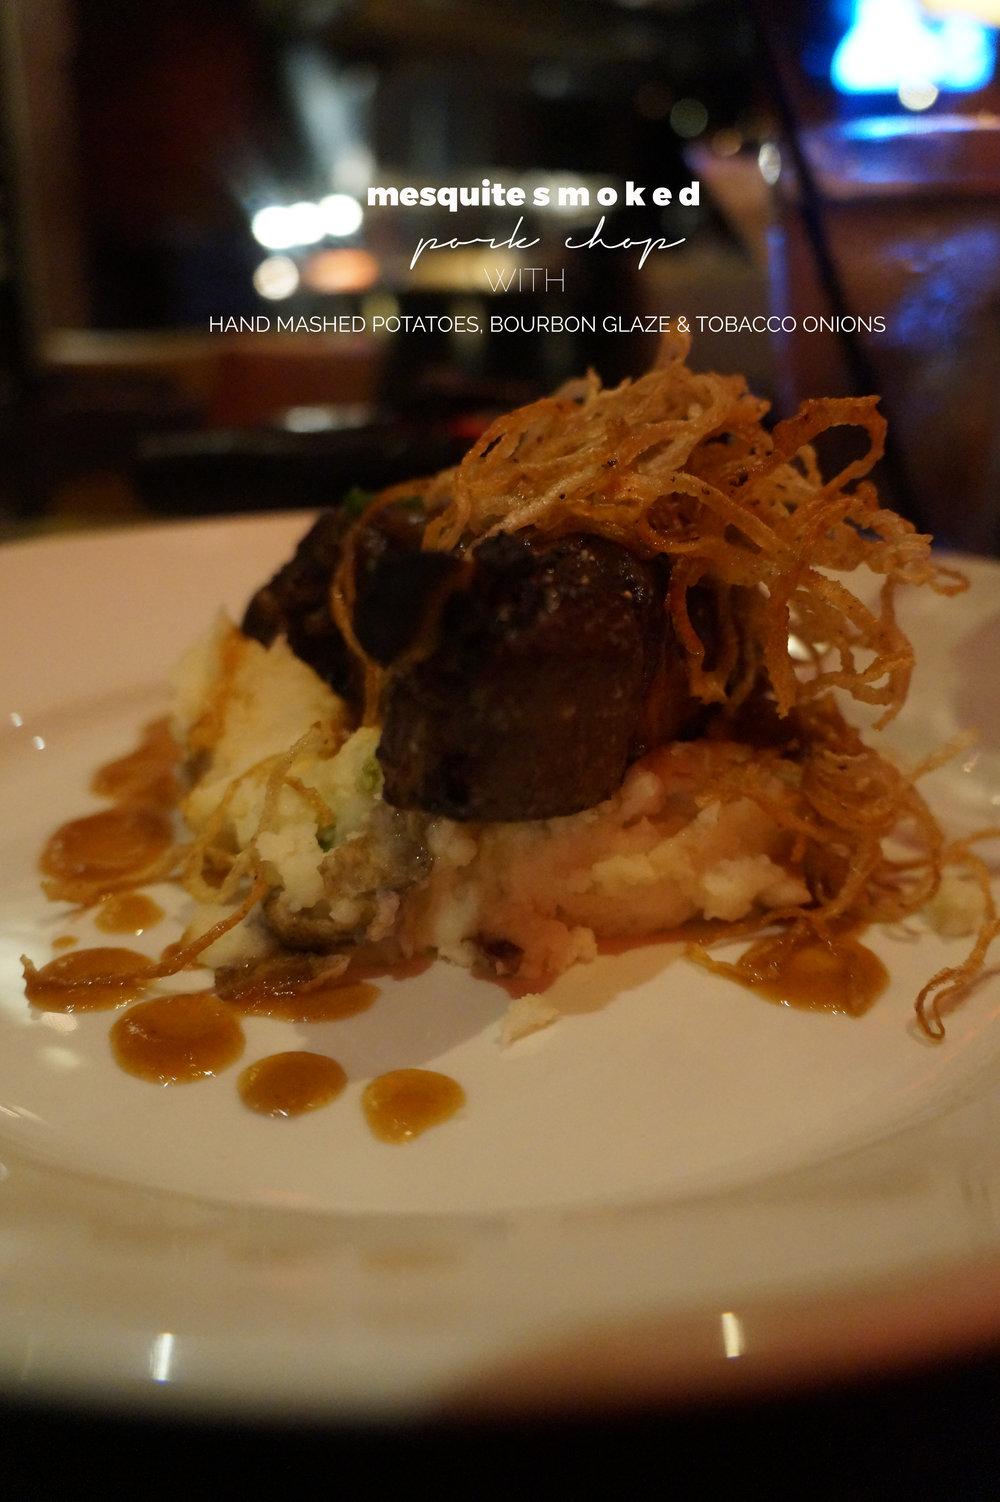 Del Frisco Grille Atlanta Mesquite Smoked Pork Chop